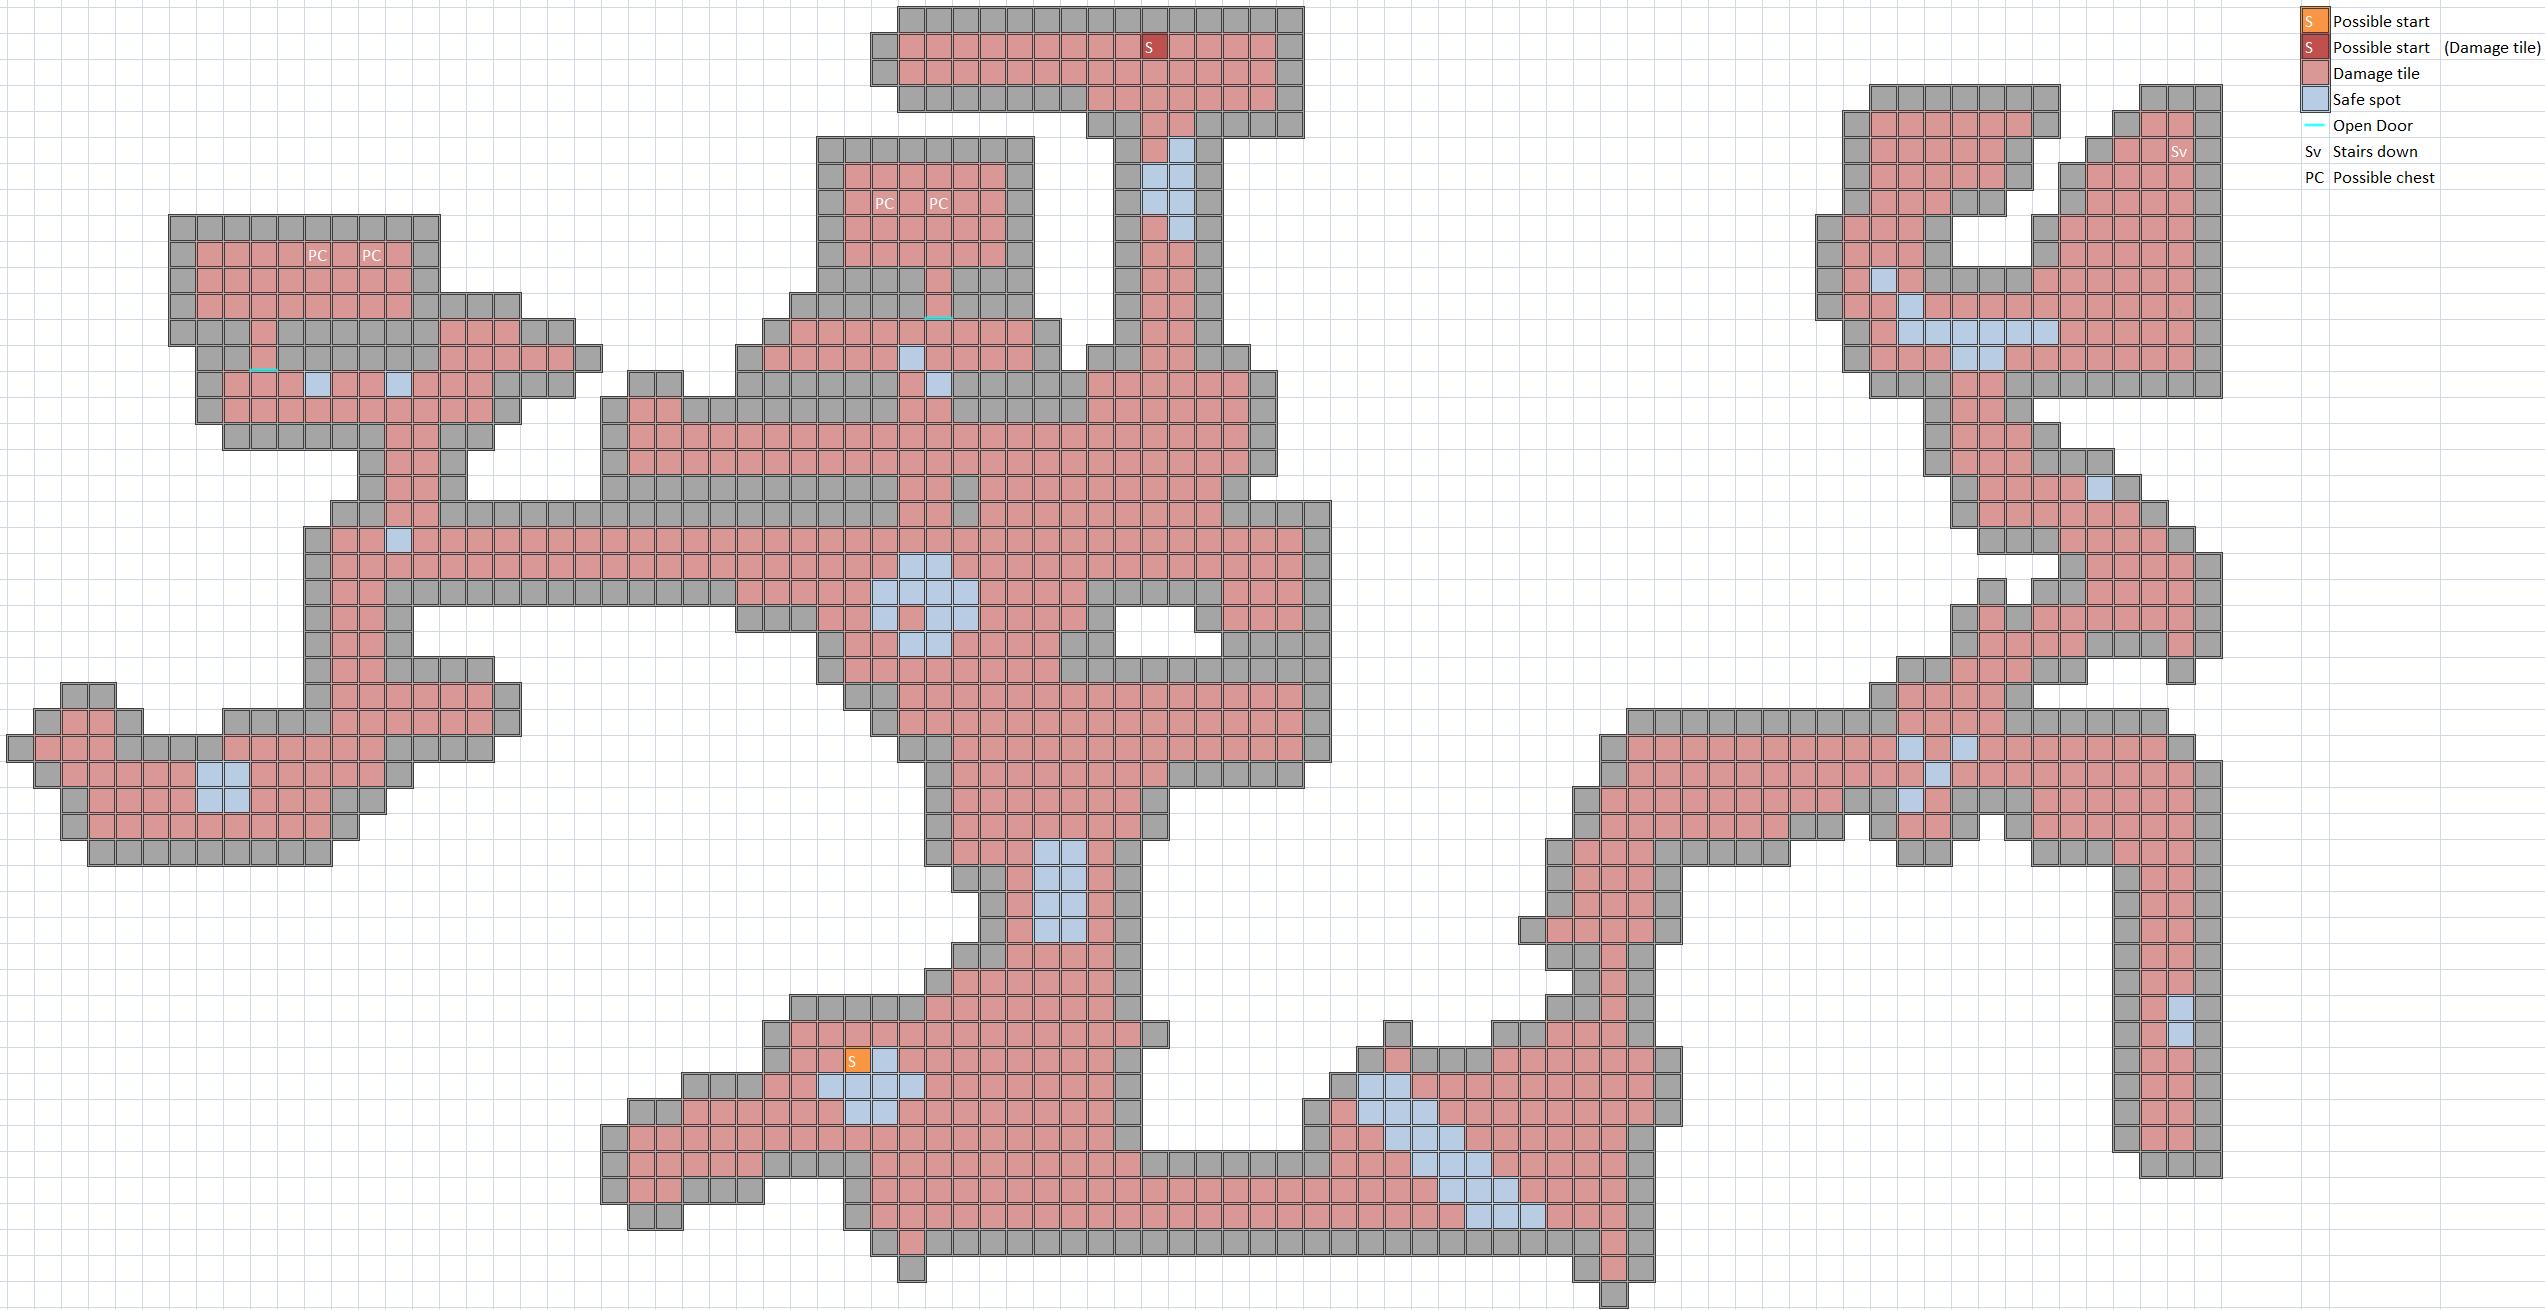 Scalding Bats Map